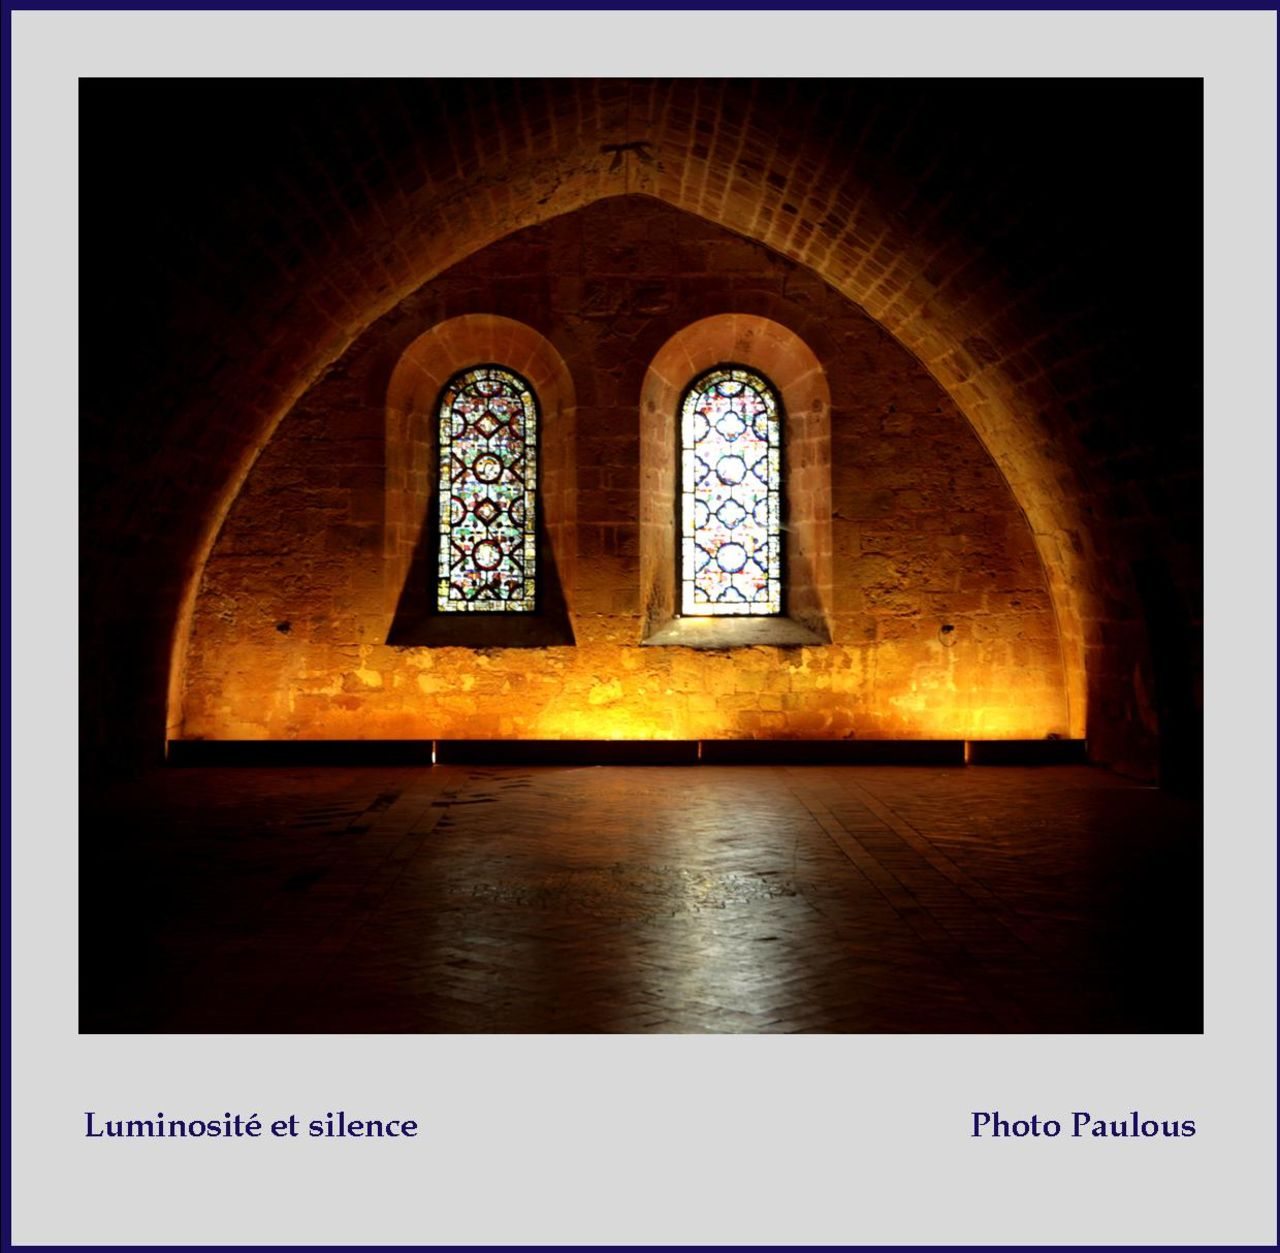 Paulous Lumino et silence